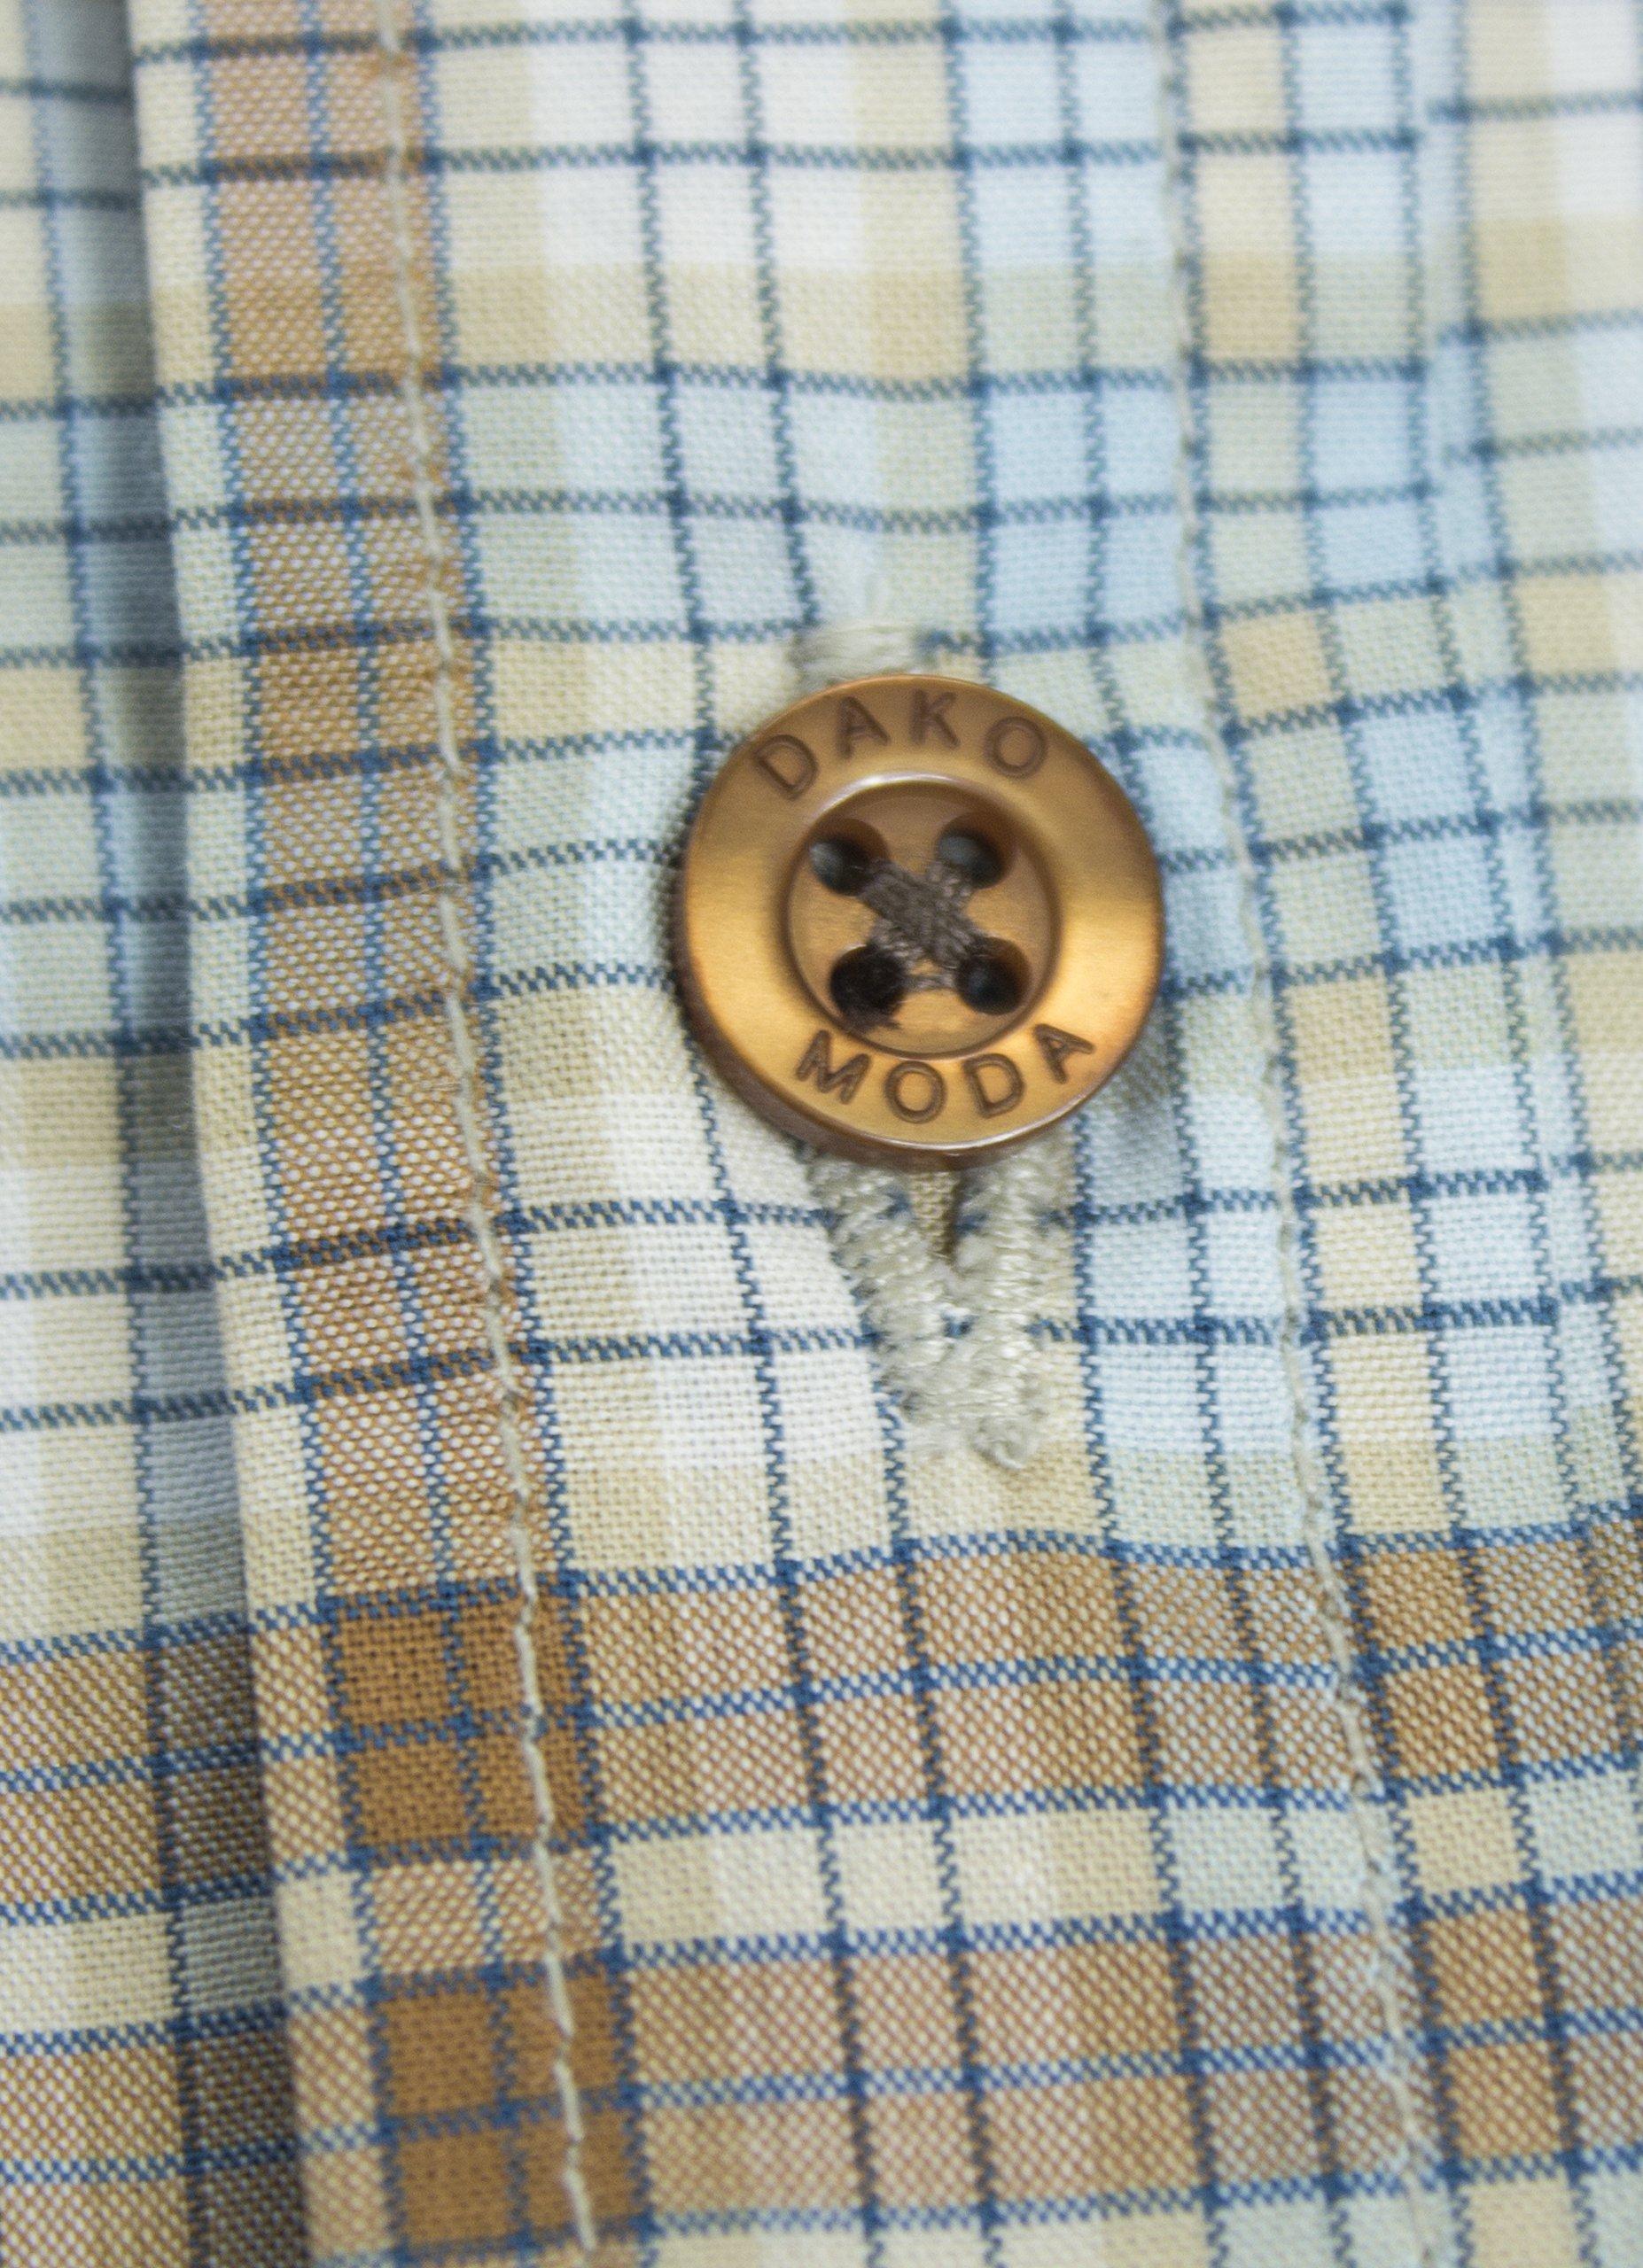 Dakomoda Toddler Boys' Short Sleeve Easter Shirt Brown Plaid Check 100% Pima Cotton Dress Shirt 3T by Dakomoda (Image #1)